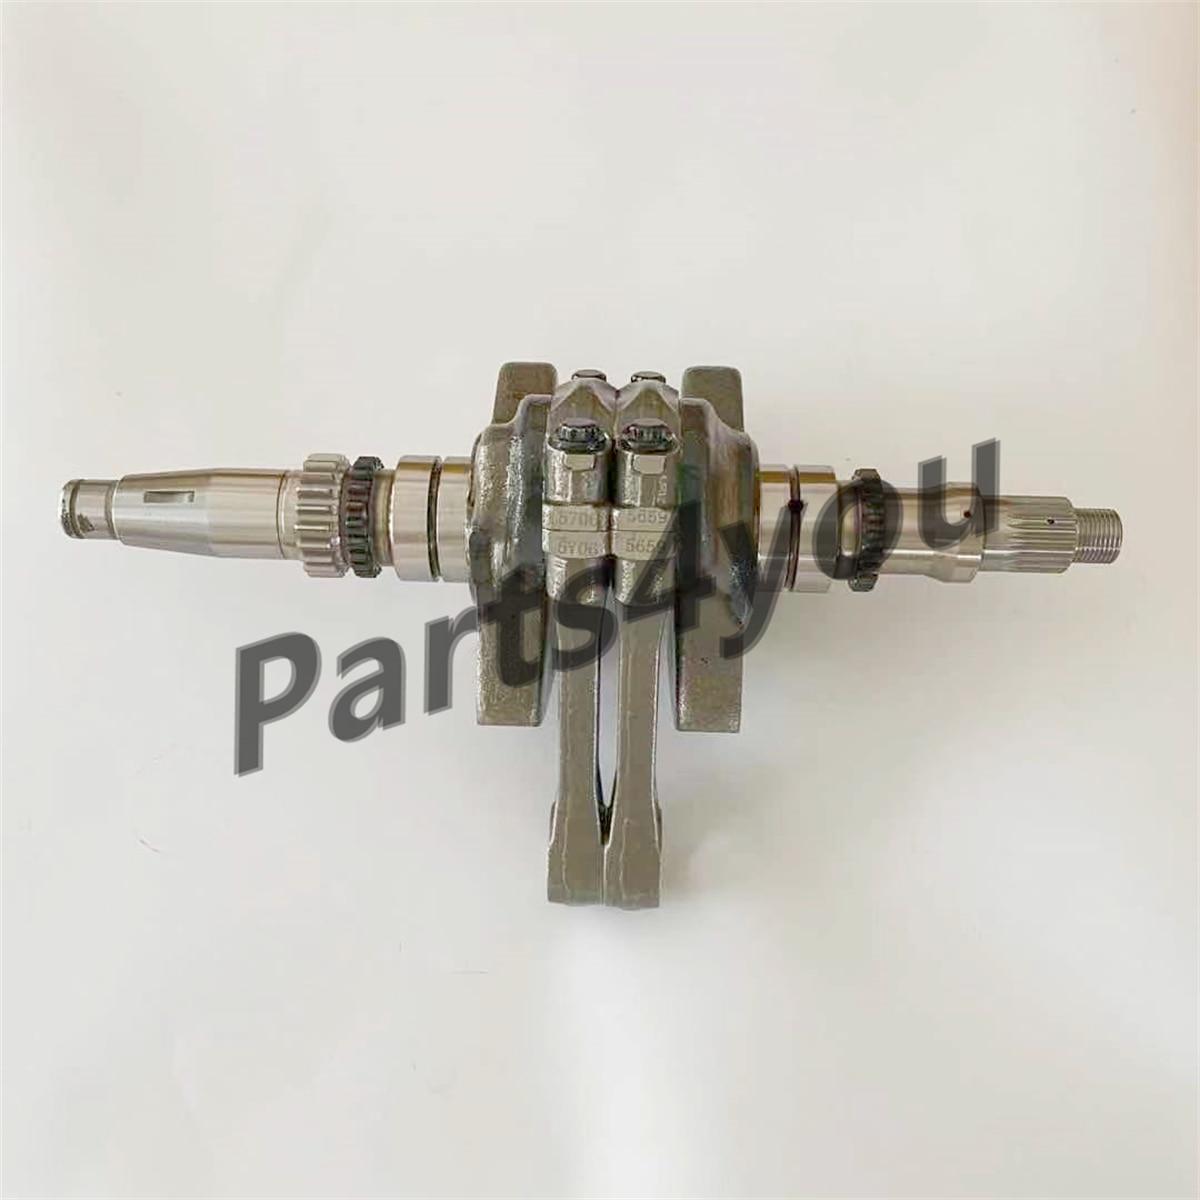 Crankshaft Connecting Rod Assy for CFmoto ATV UTV 800 U8 X8 Z8 0800-041000-2002 0800-041000-0002 0800-041000-10020 Mark  B enlarge